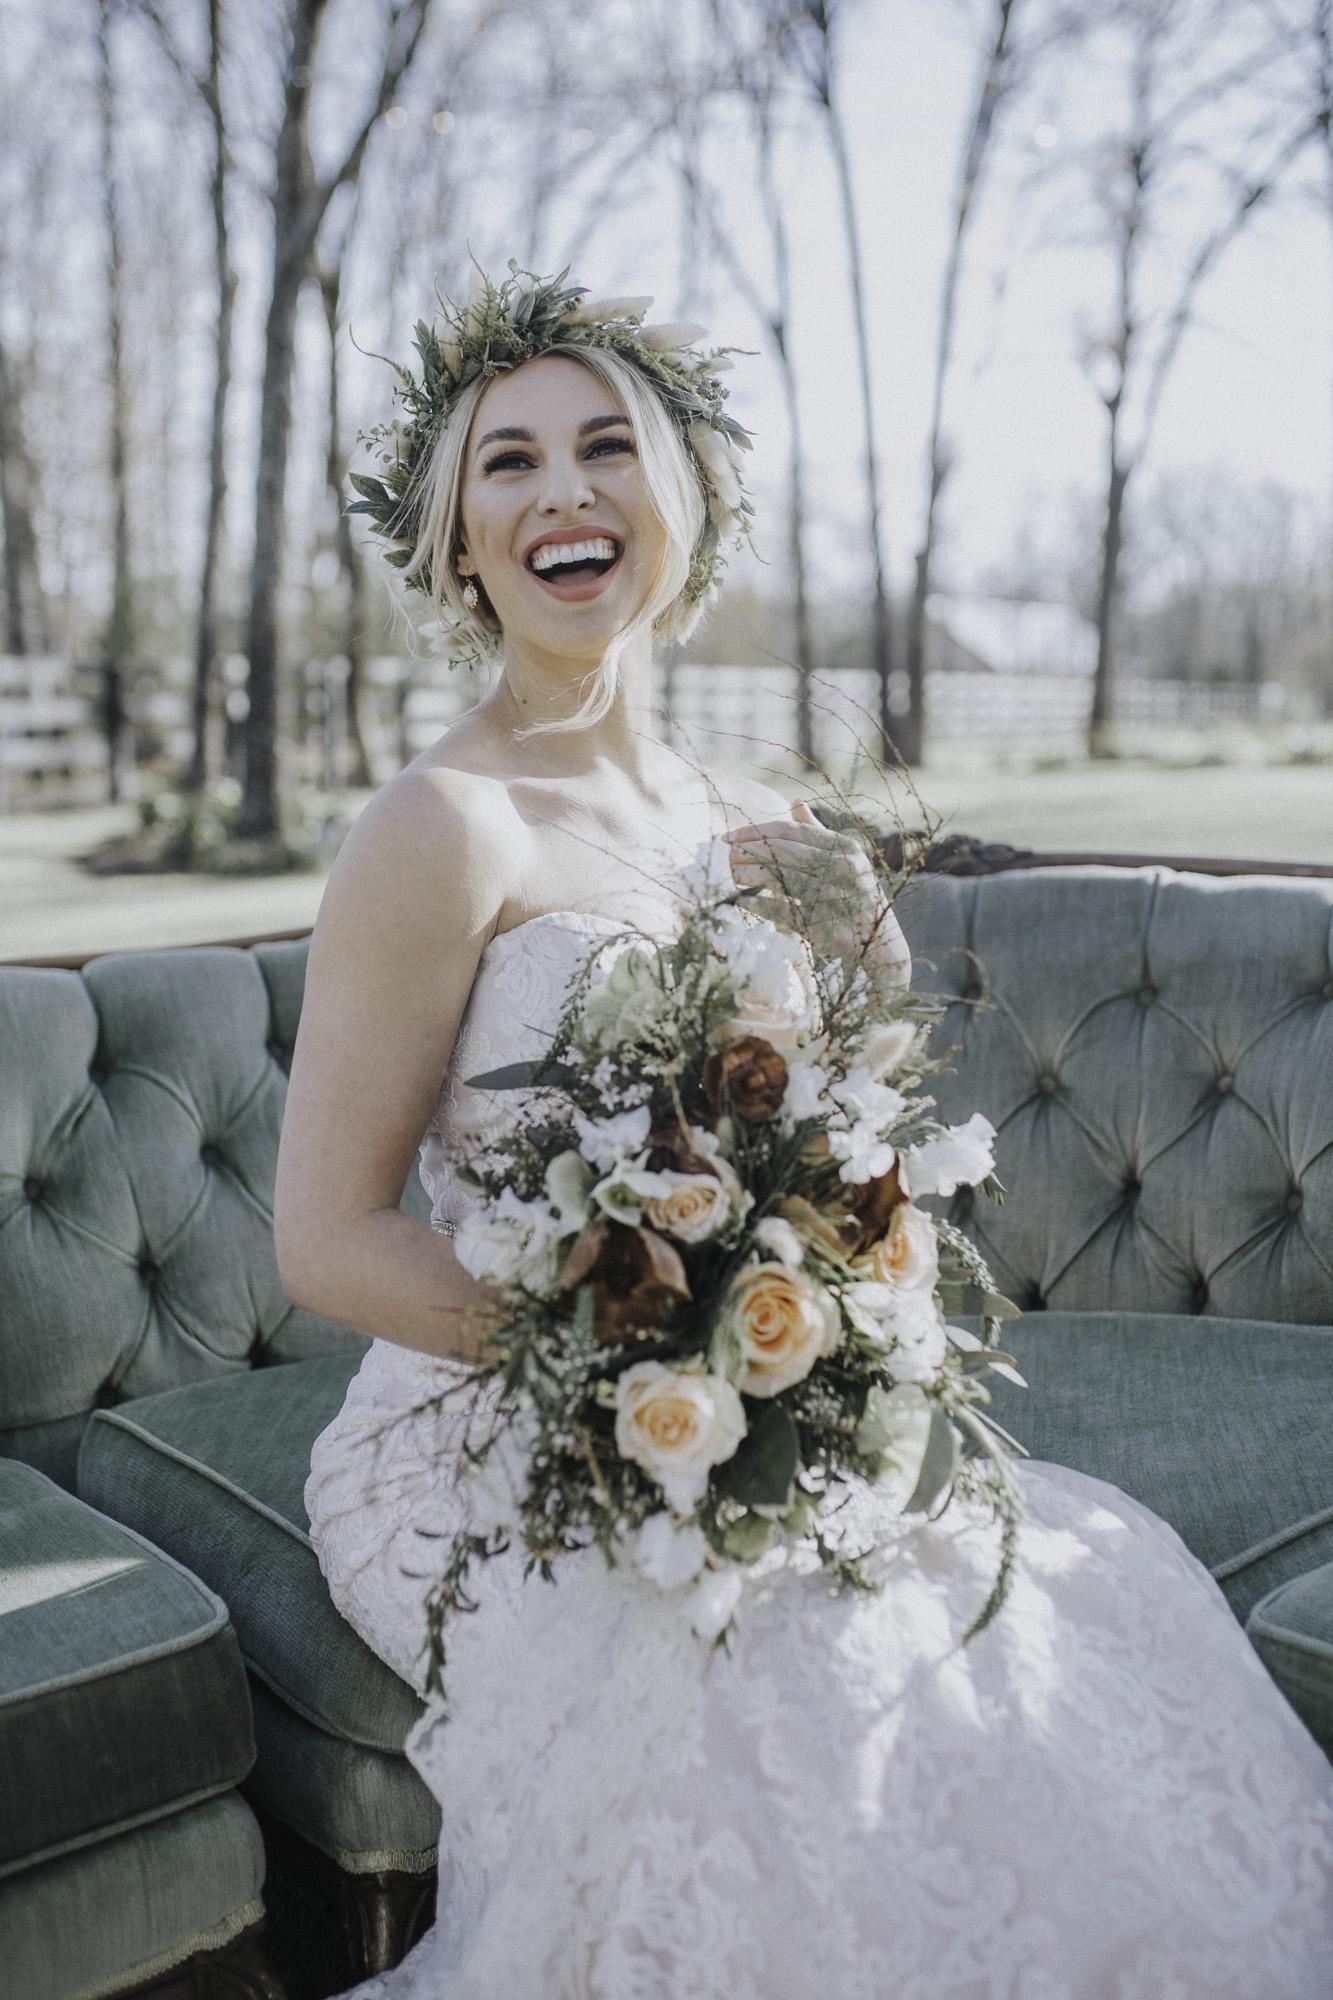 Cate_Ann_Photography_Dayton_Ohio_Wedding_Elopement_And_Engagement_PhotographerIMG_8598.jpg